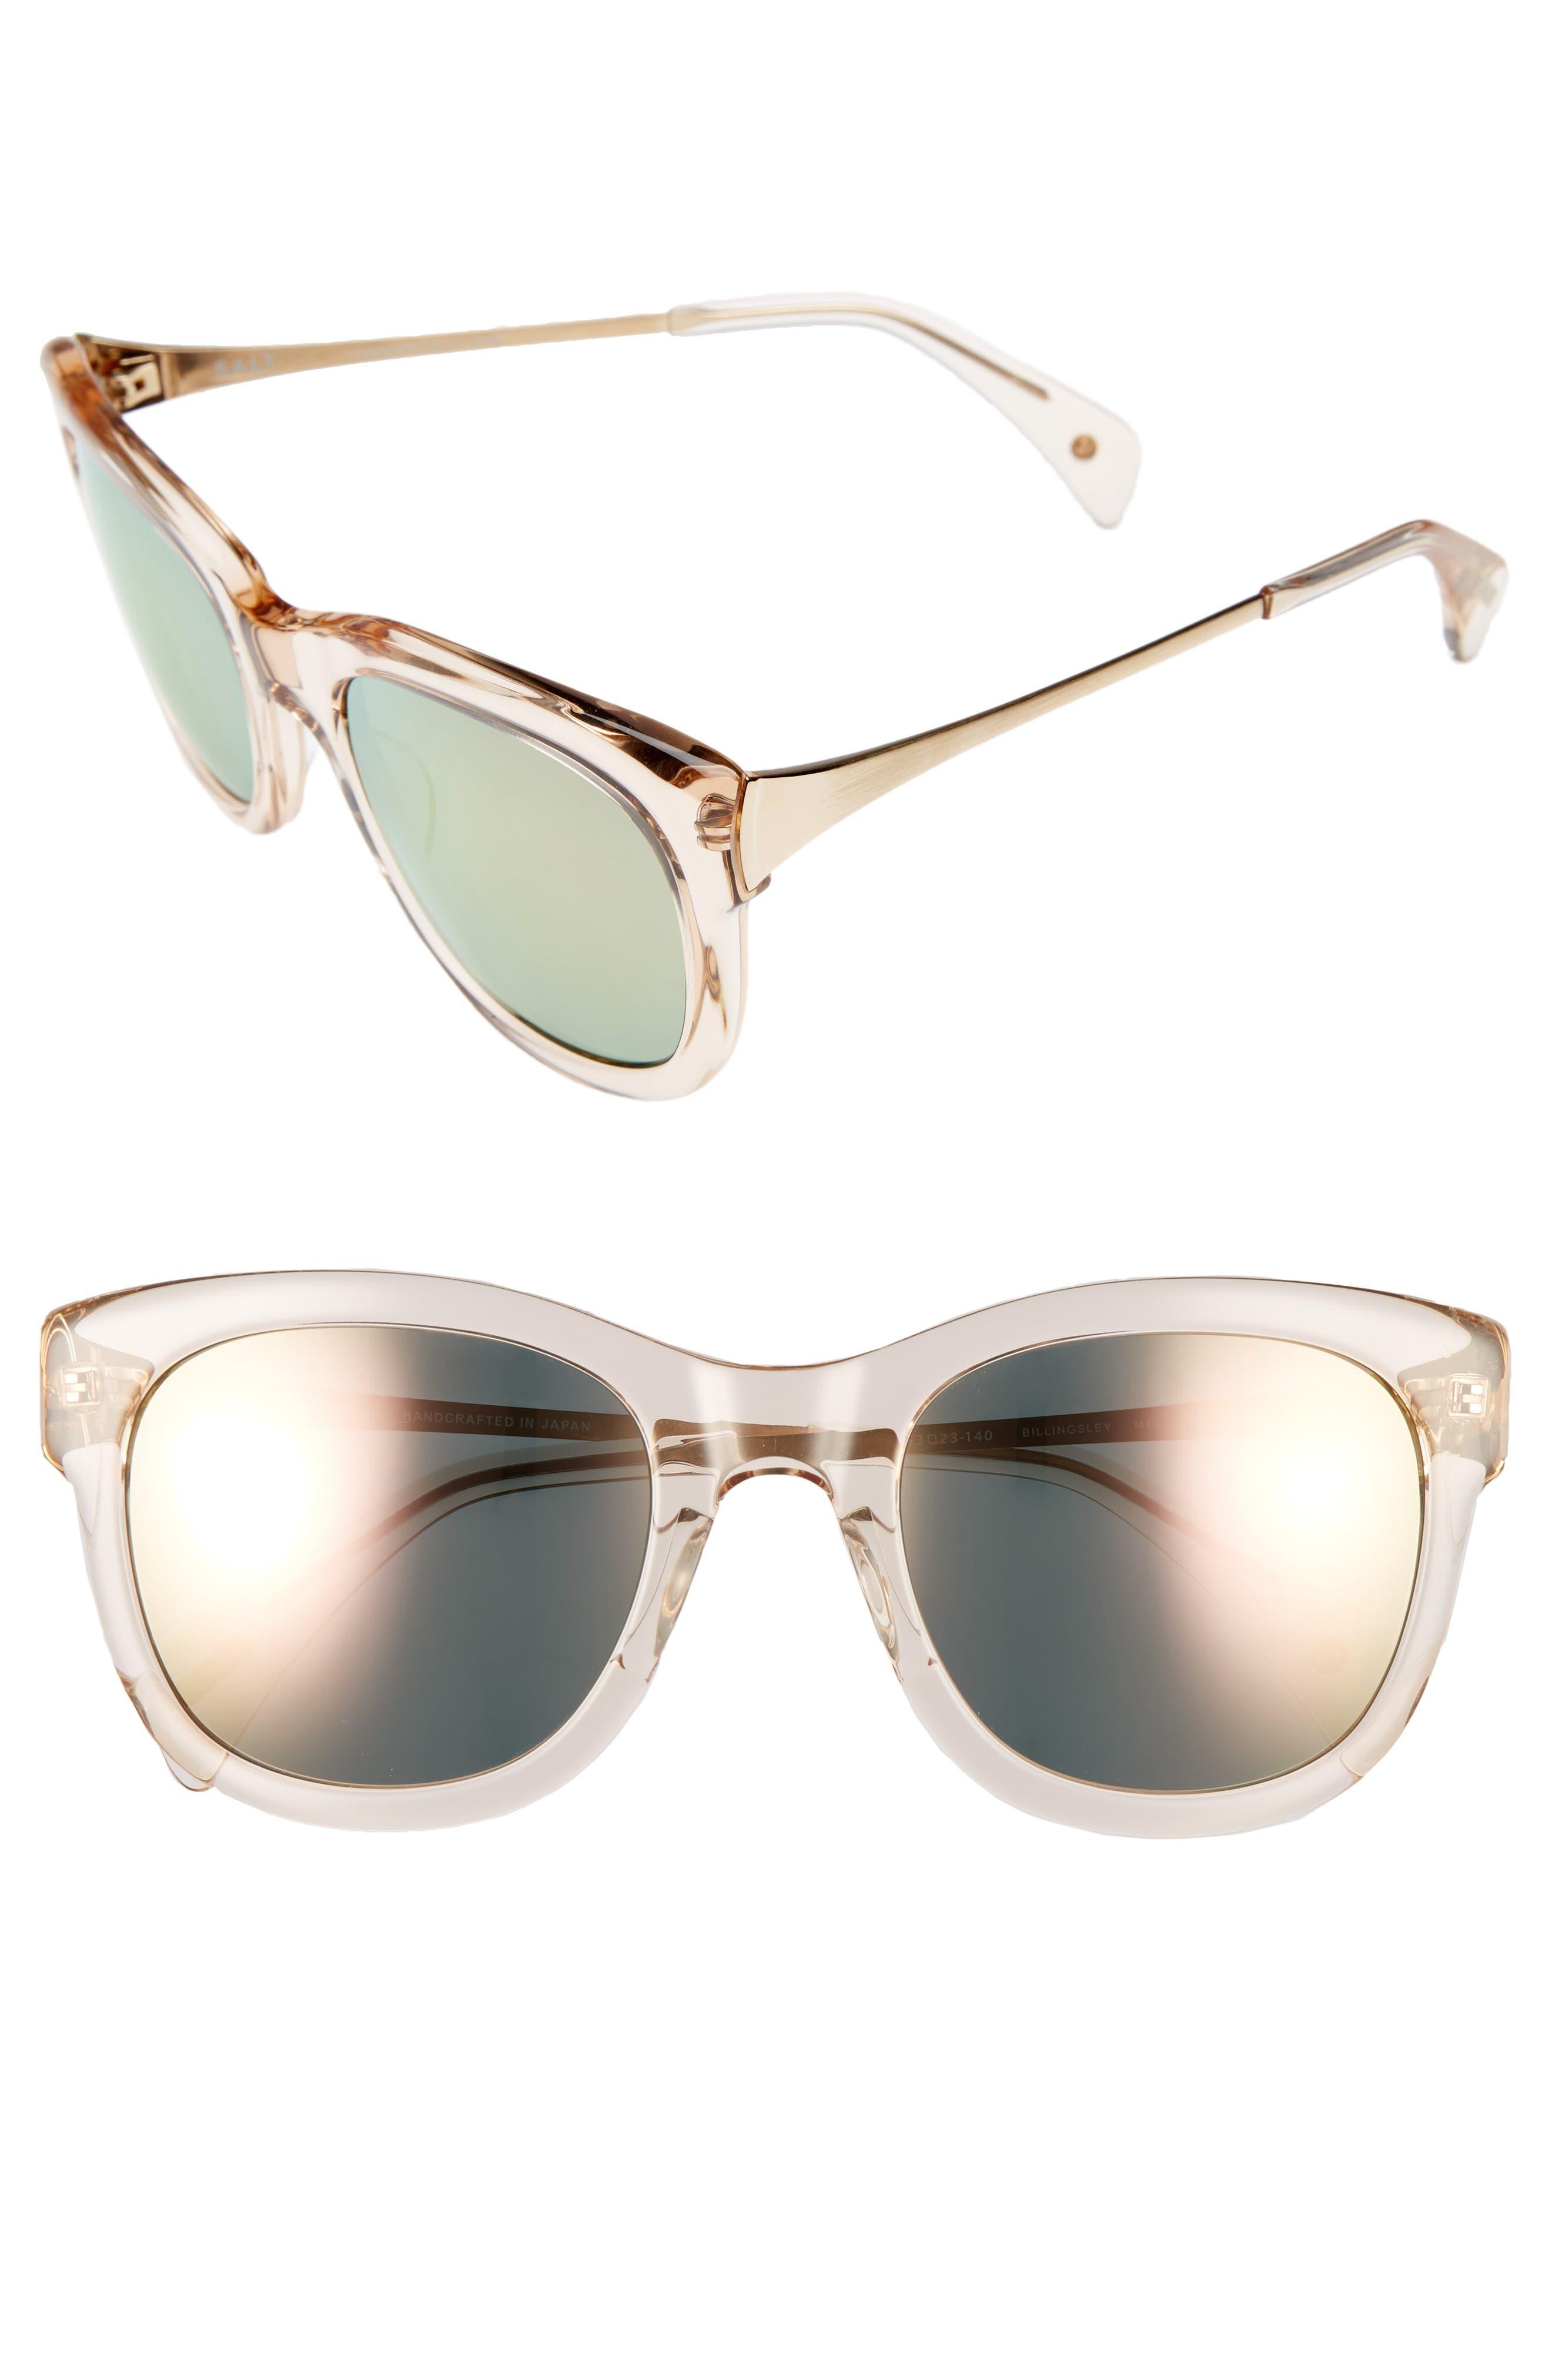 Main Image - SALT Billingsley 53mm Polarized Rectangular Sunglasses